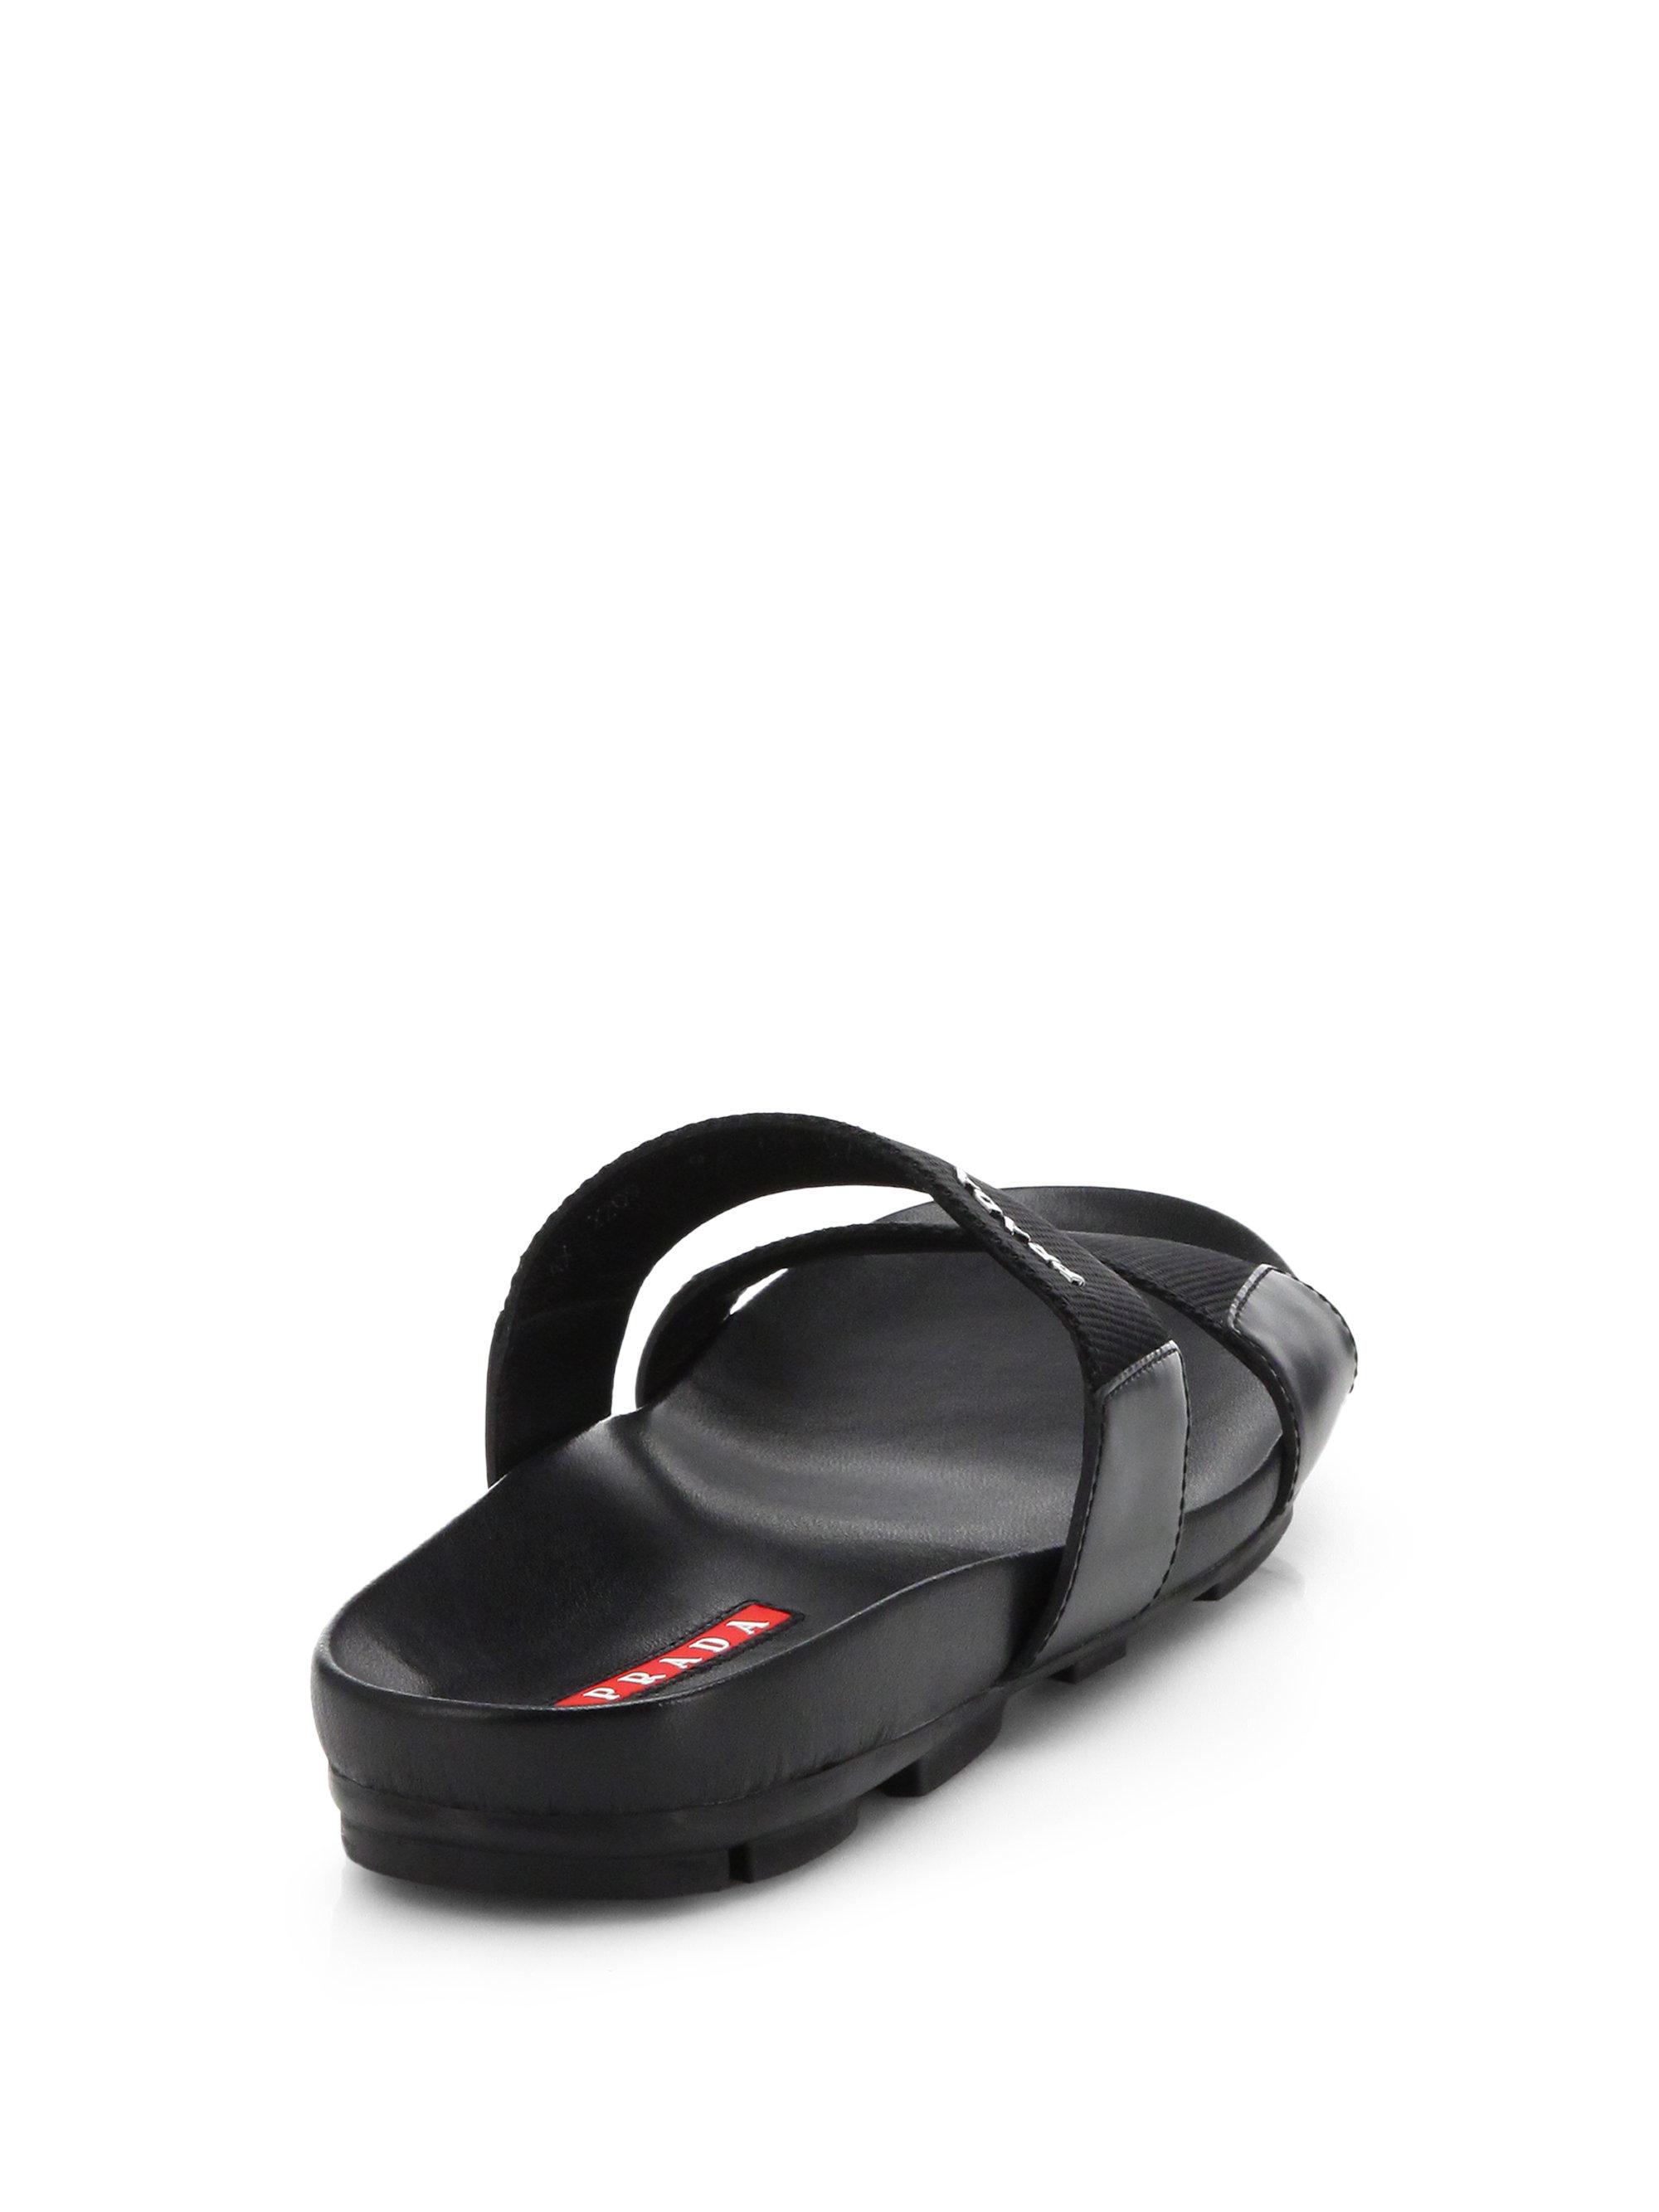 43bbede1a61f26 Lyst - Prada Double-Strap Nylon Sandals in Black for Men